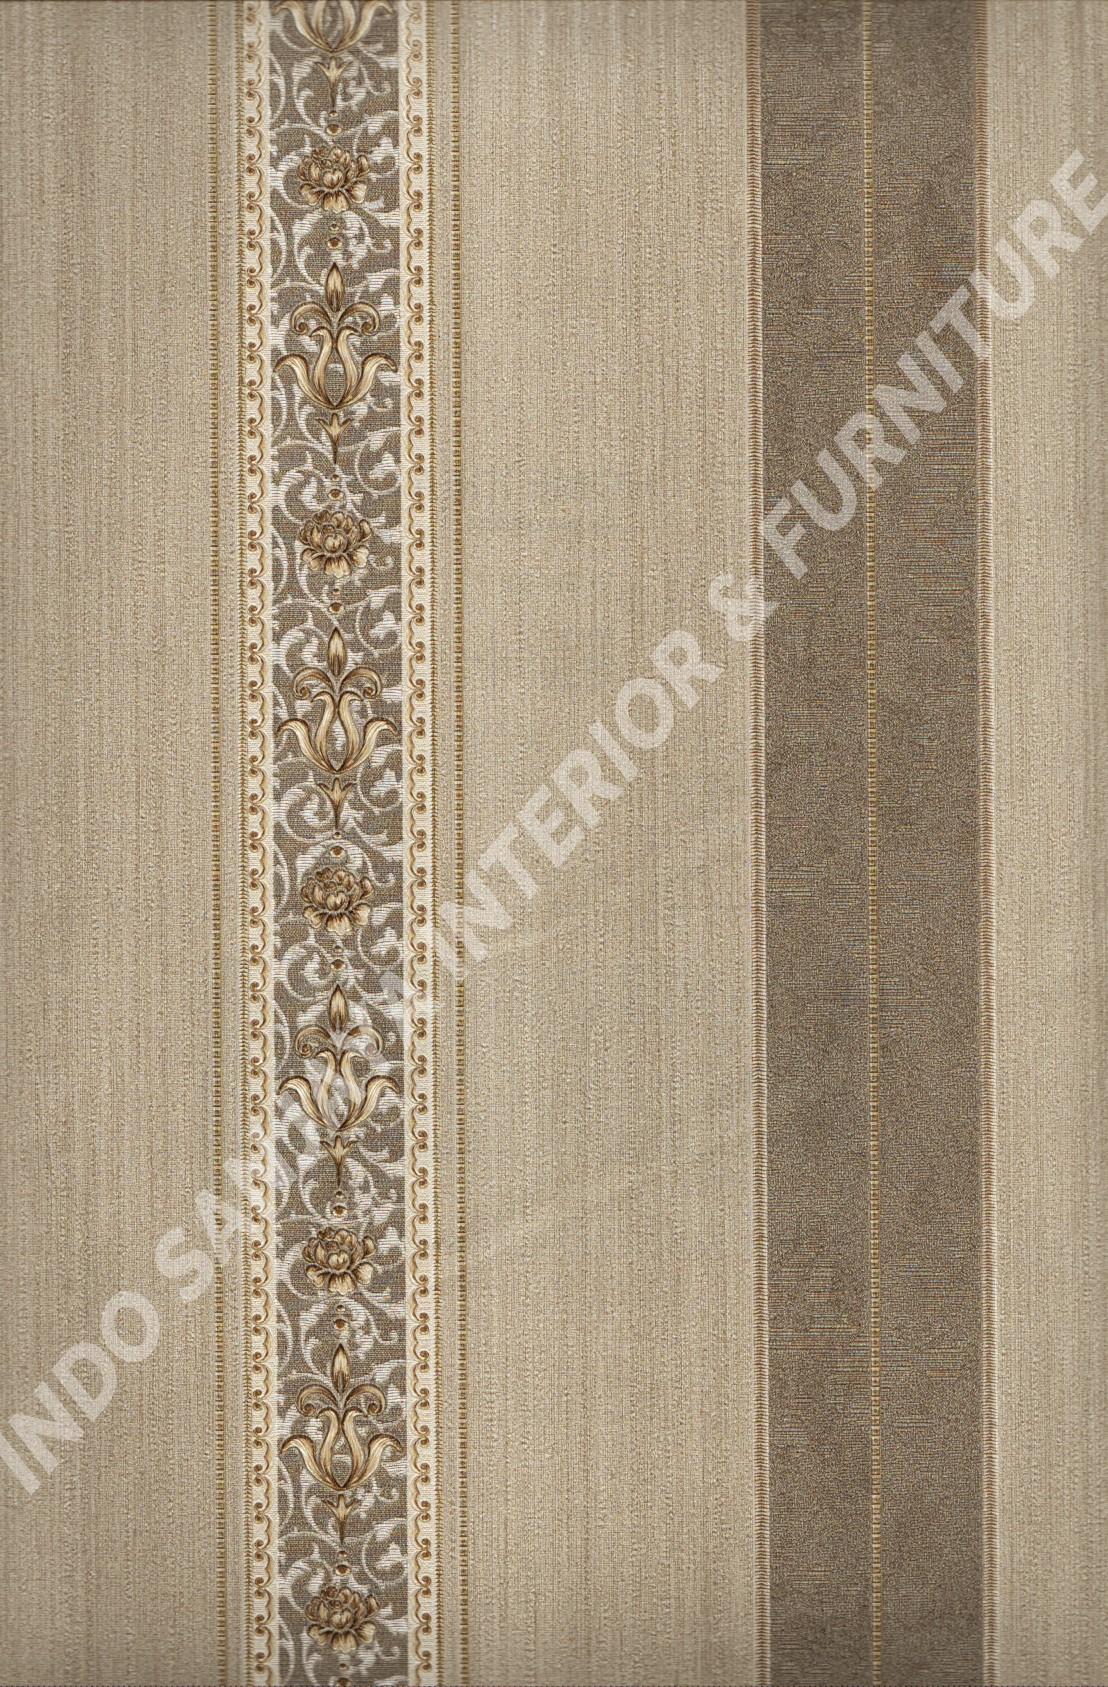 wallpaper   Wallpaper Klasik Batik (Damask) YG80205:YG80205 corak  warna